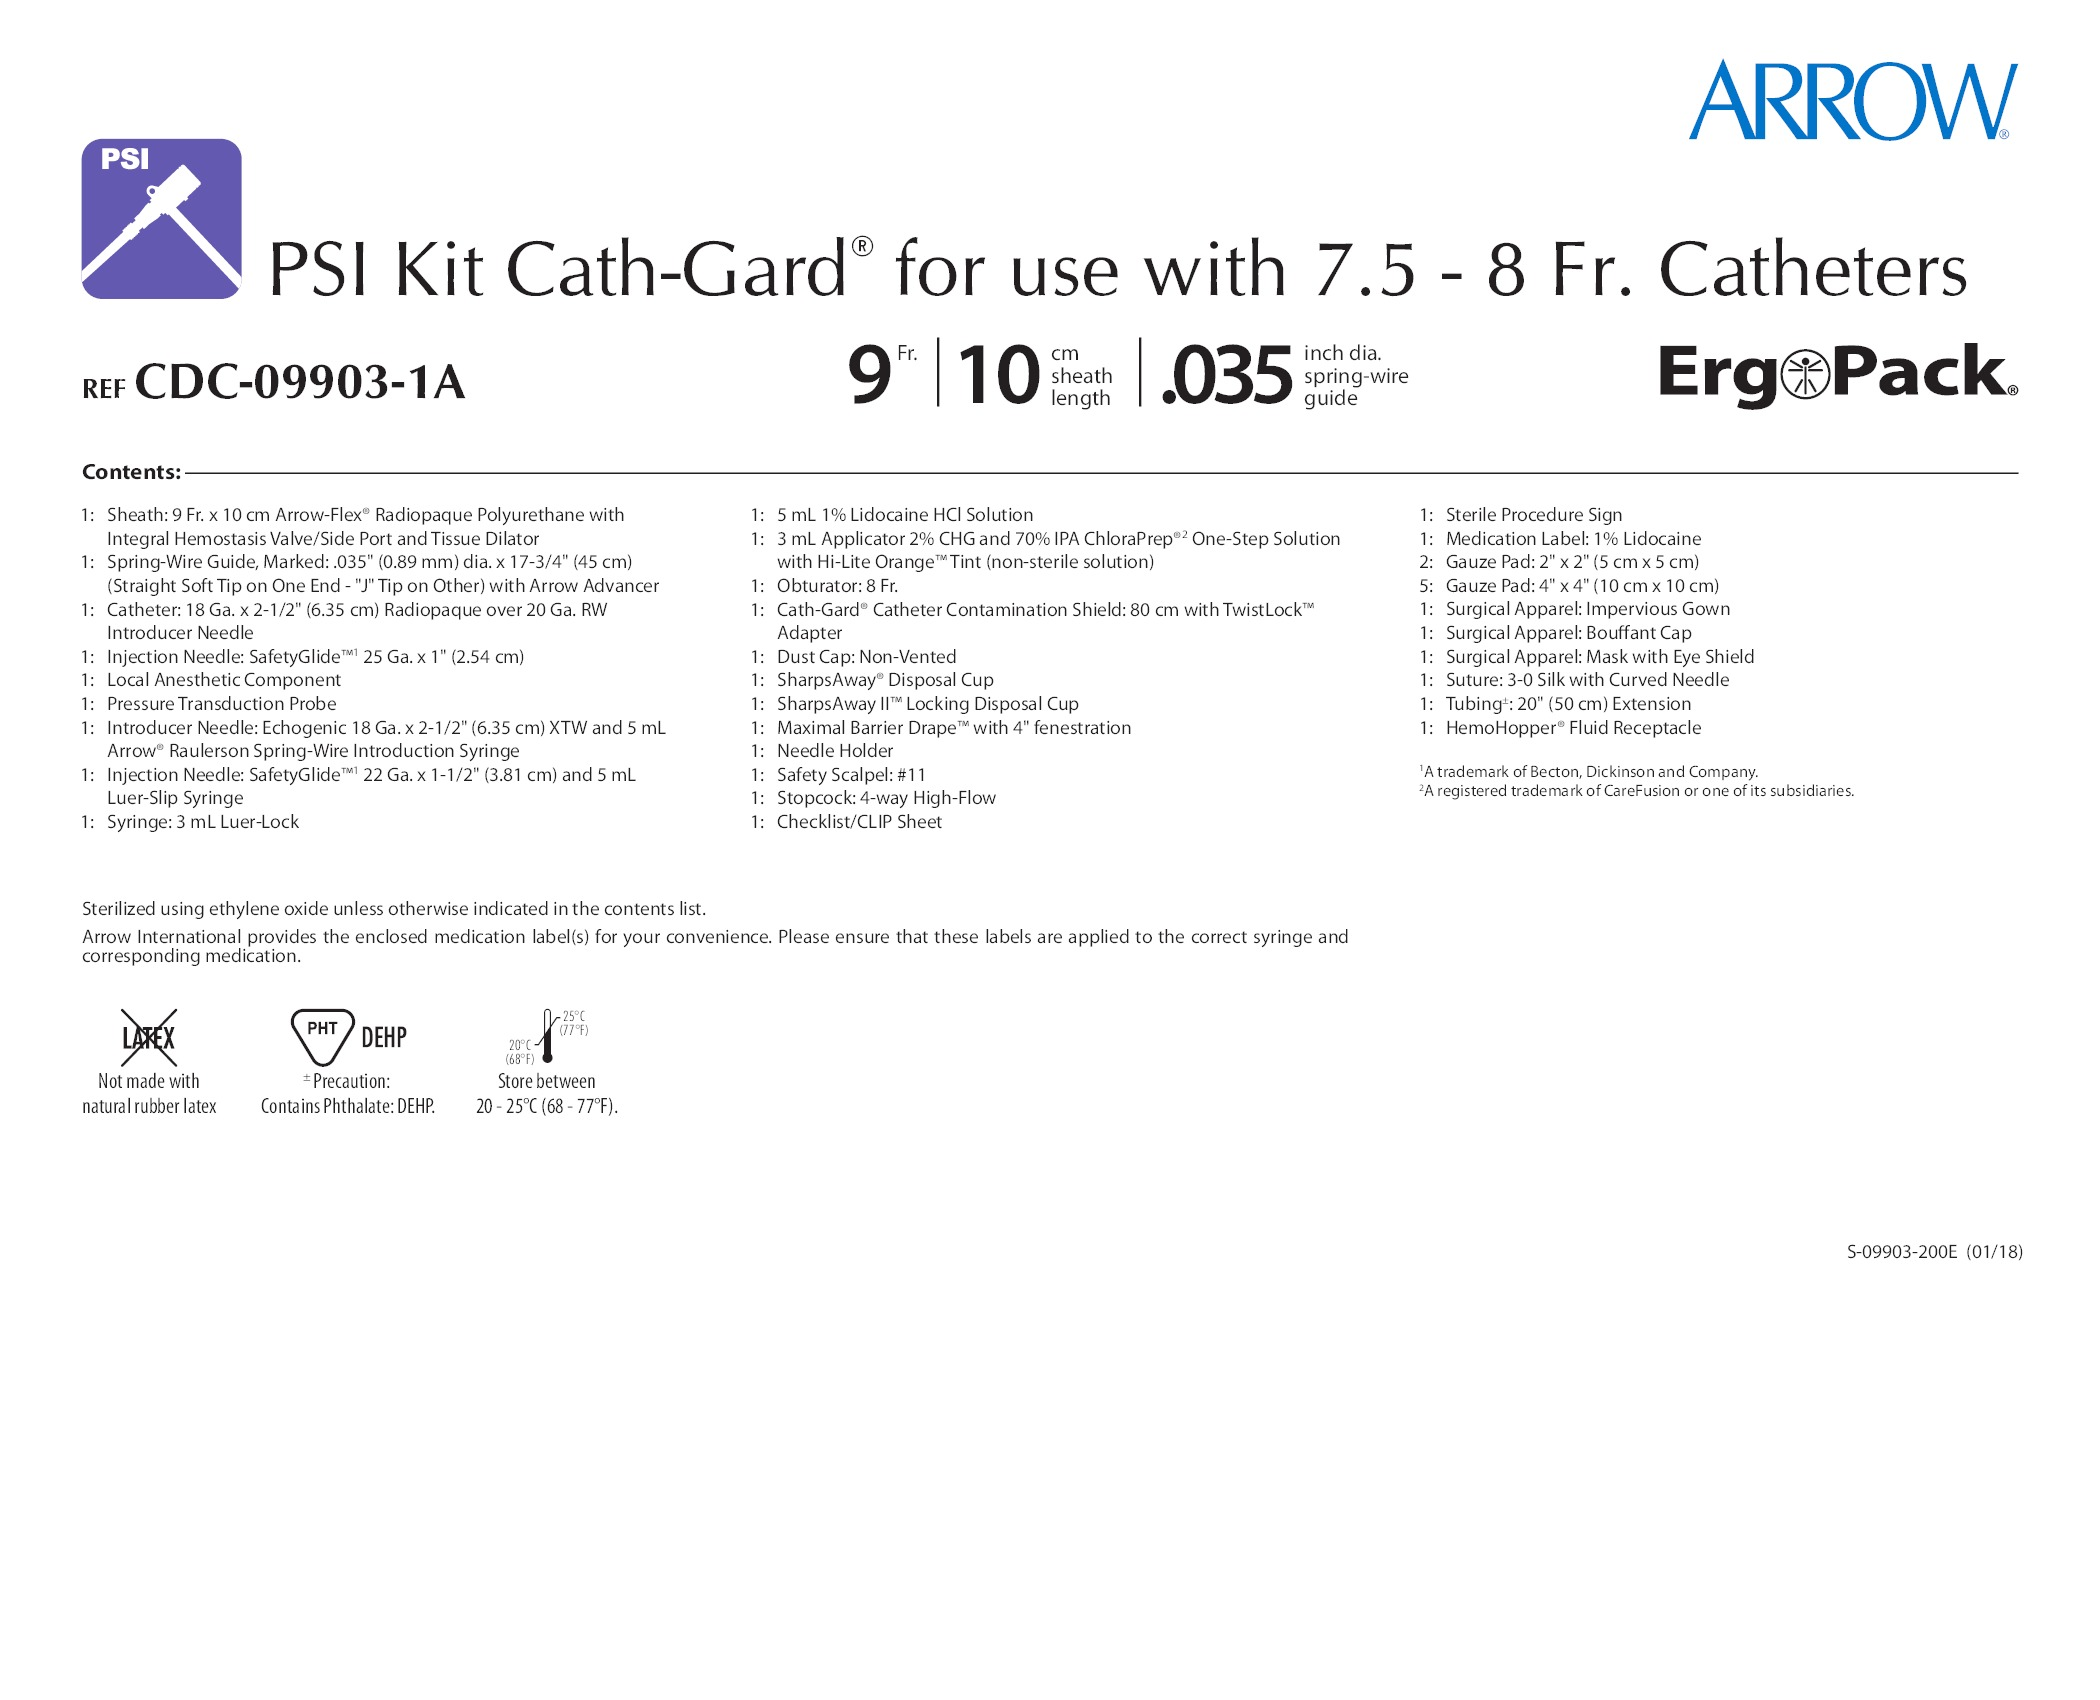 CDC-09903-1A - Teleflex Incorporated - Vascular Access